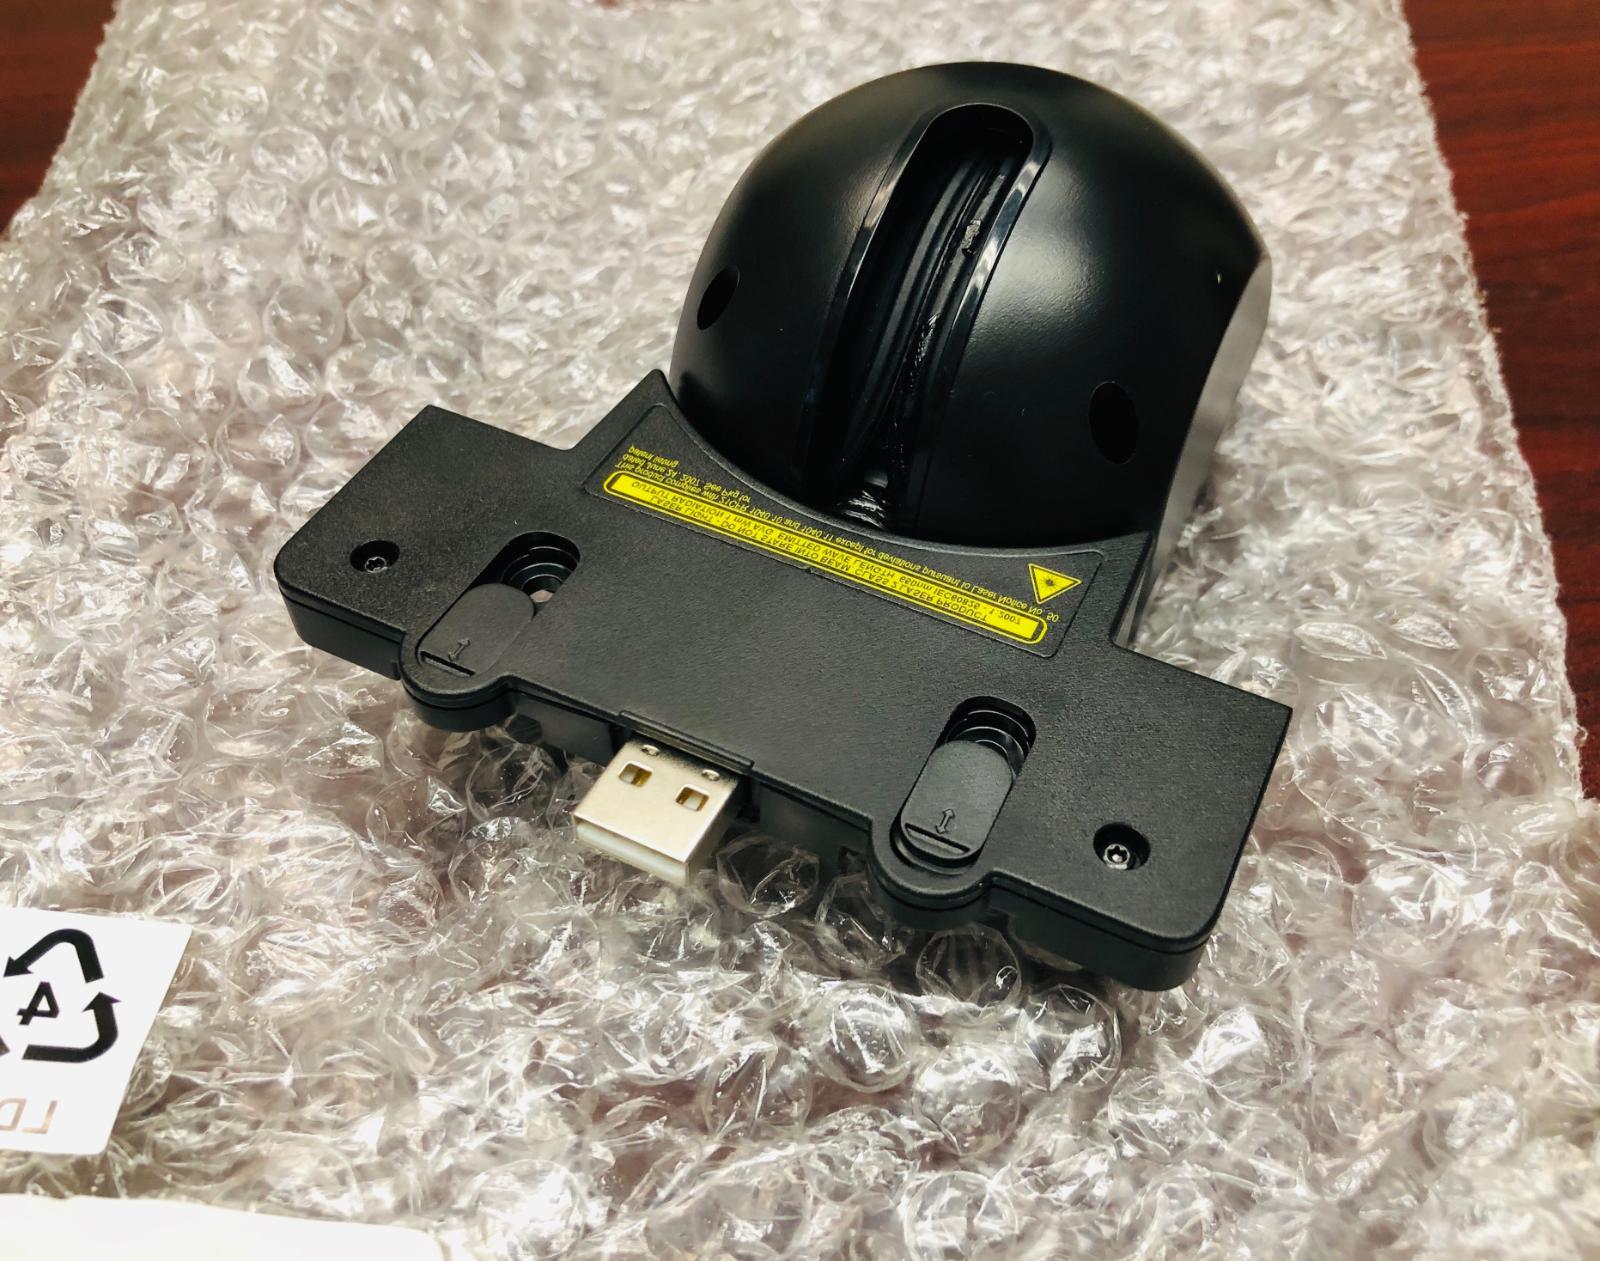 728725-001 USB